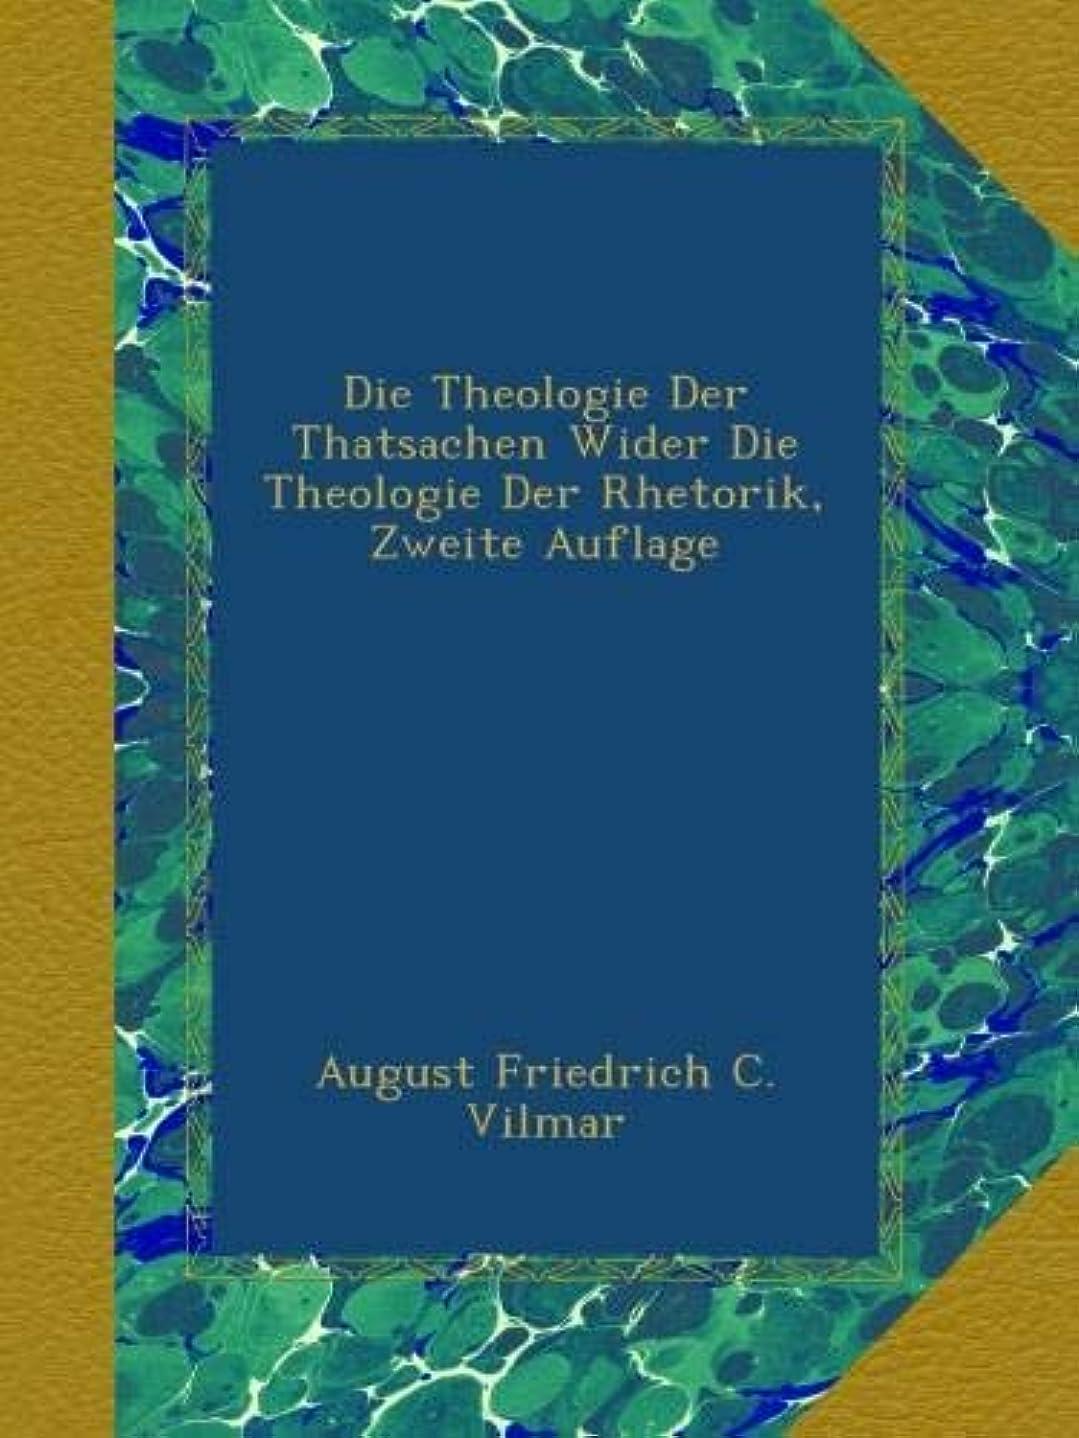 かなりモニカ密接にDie Theologie Der Thatsachen Wider Die Theologie Der Rhetorik, Zweite Auflage